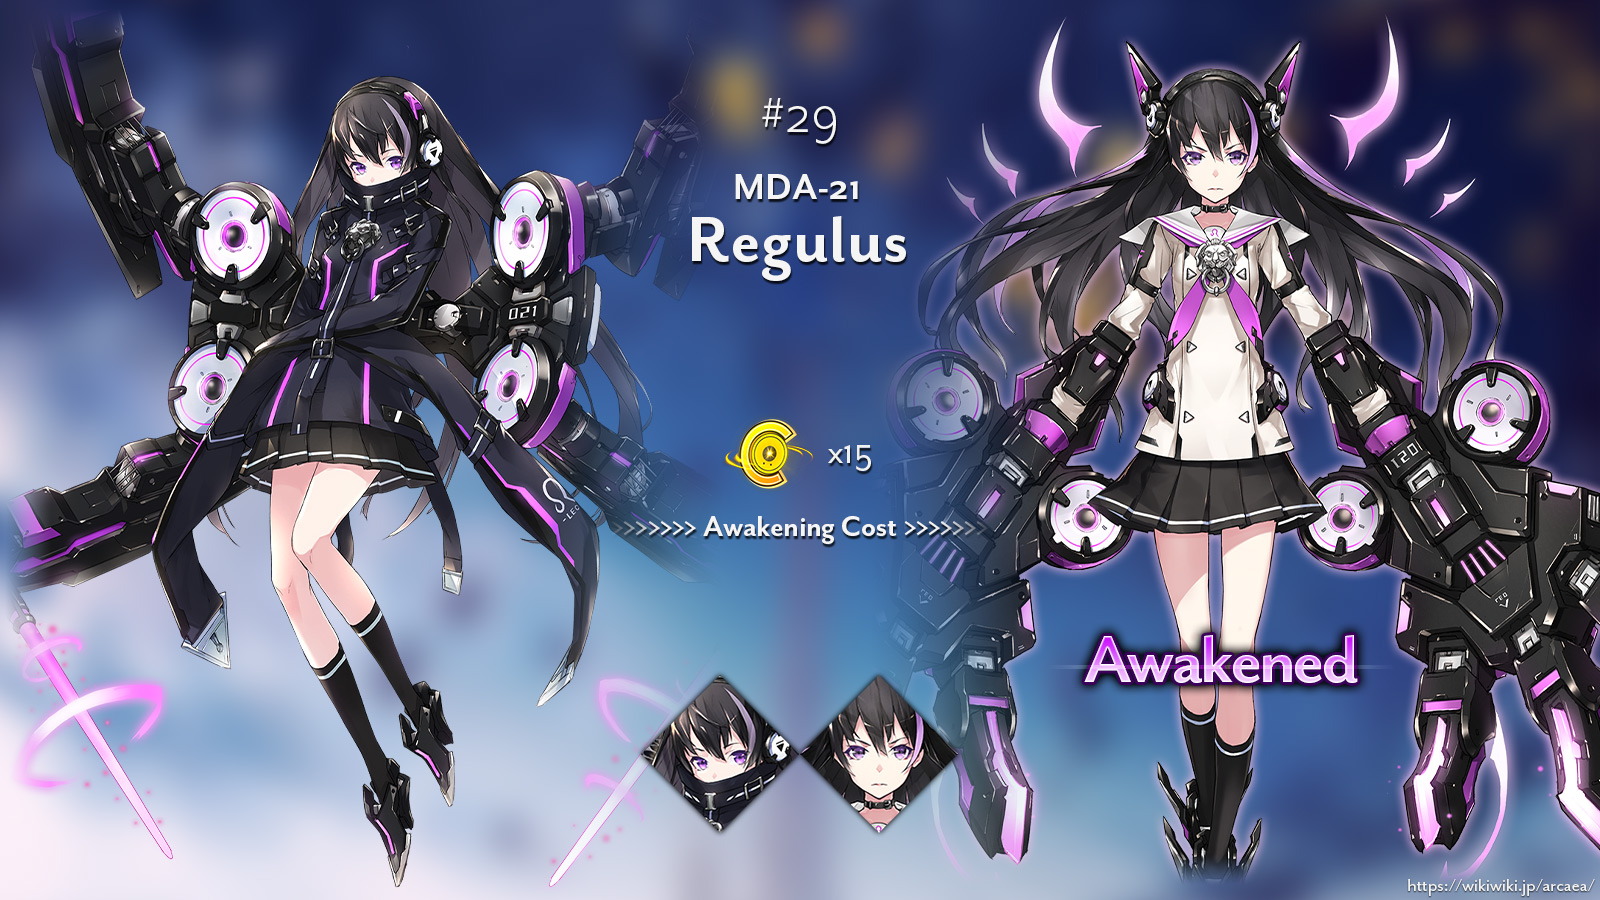 MDA-21 Regulus